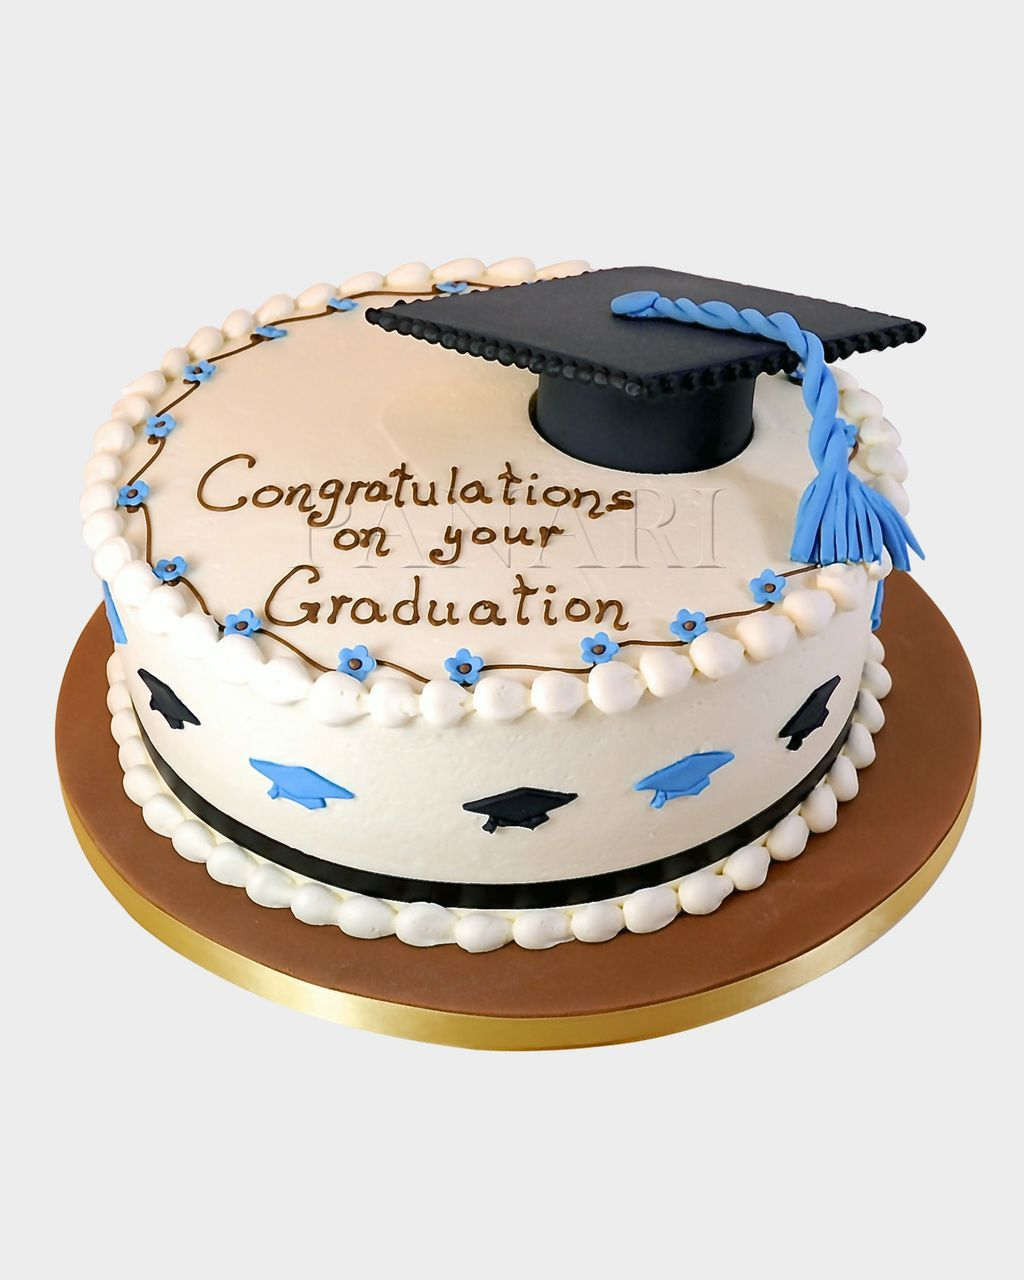 graduation cake design for kindergarten GRADUATION CAKE GC2  Graduation cakes, Kindergarten graduation